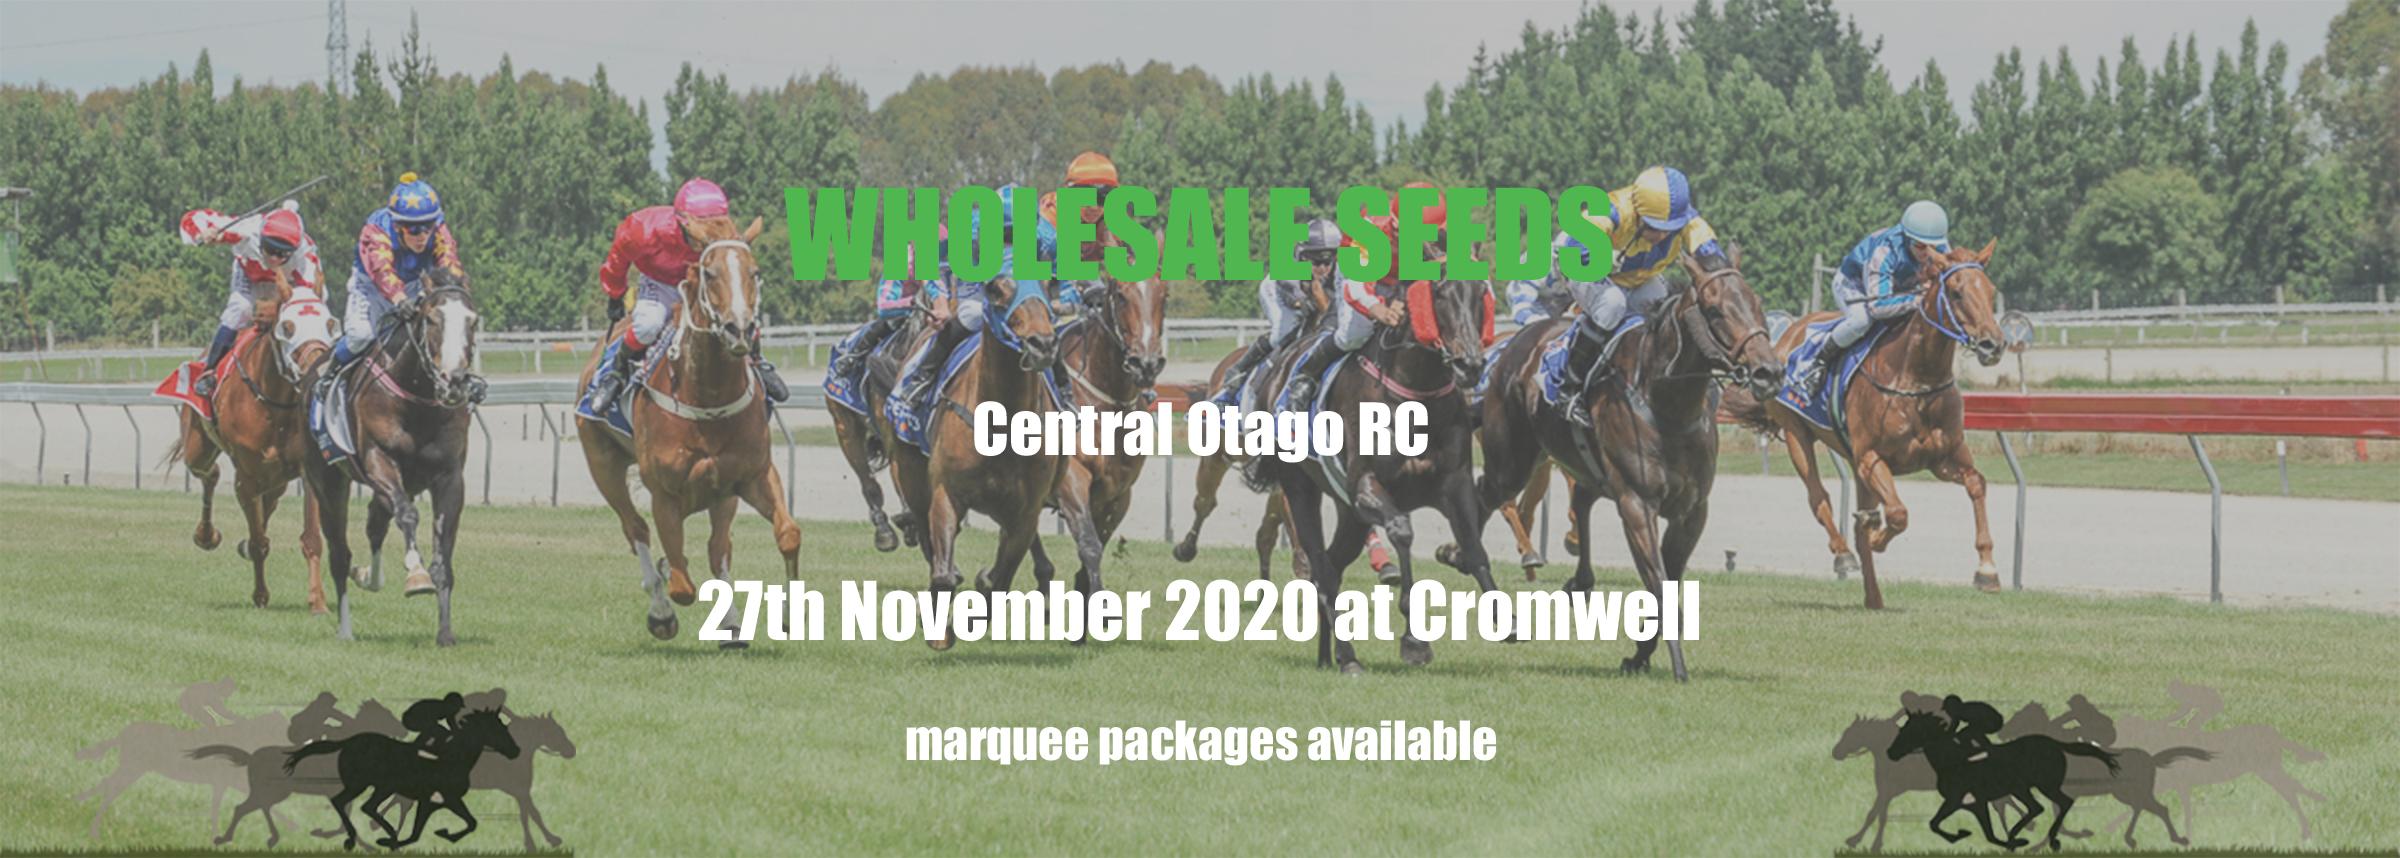 Central_Otago_RC_Ad_2020